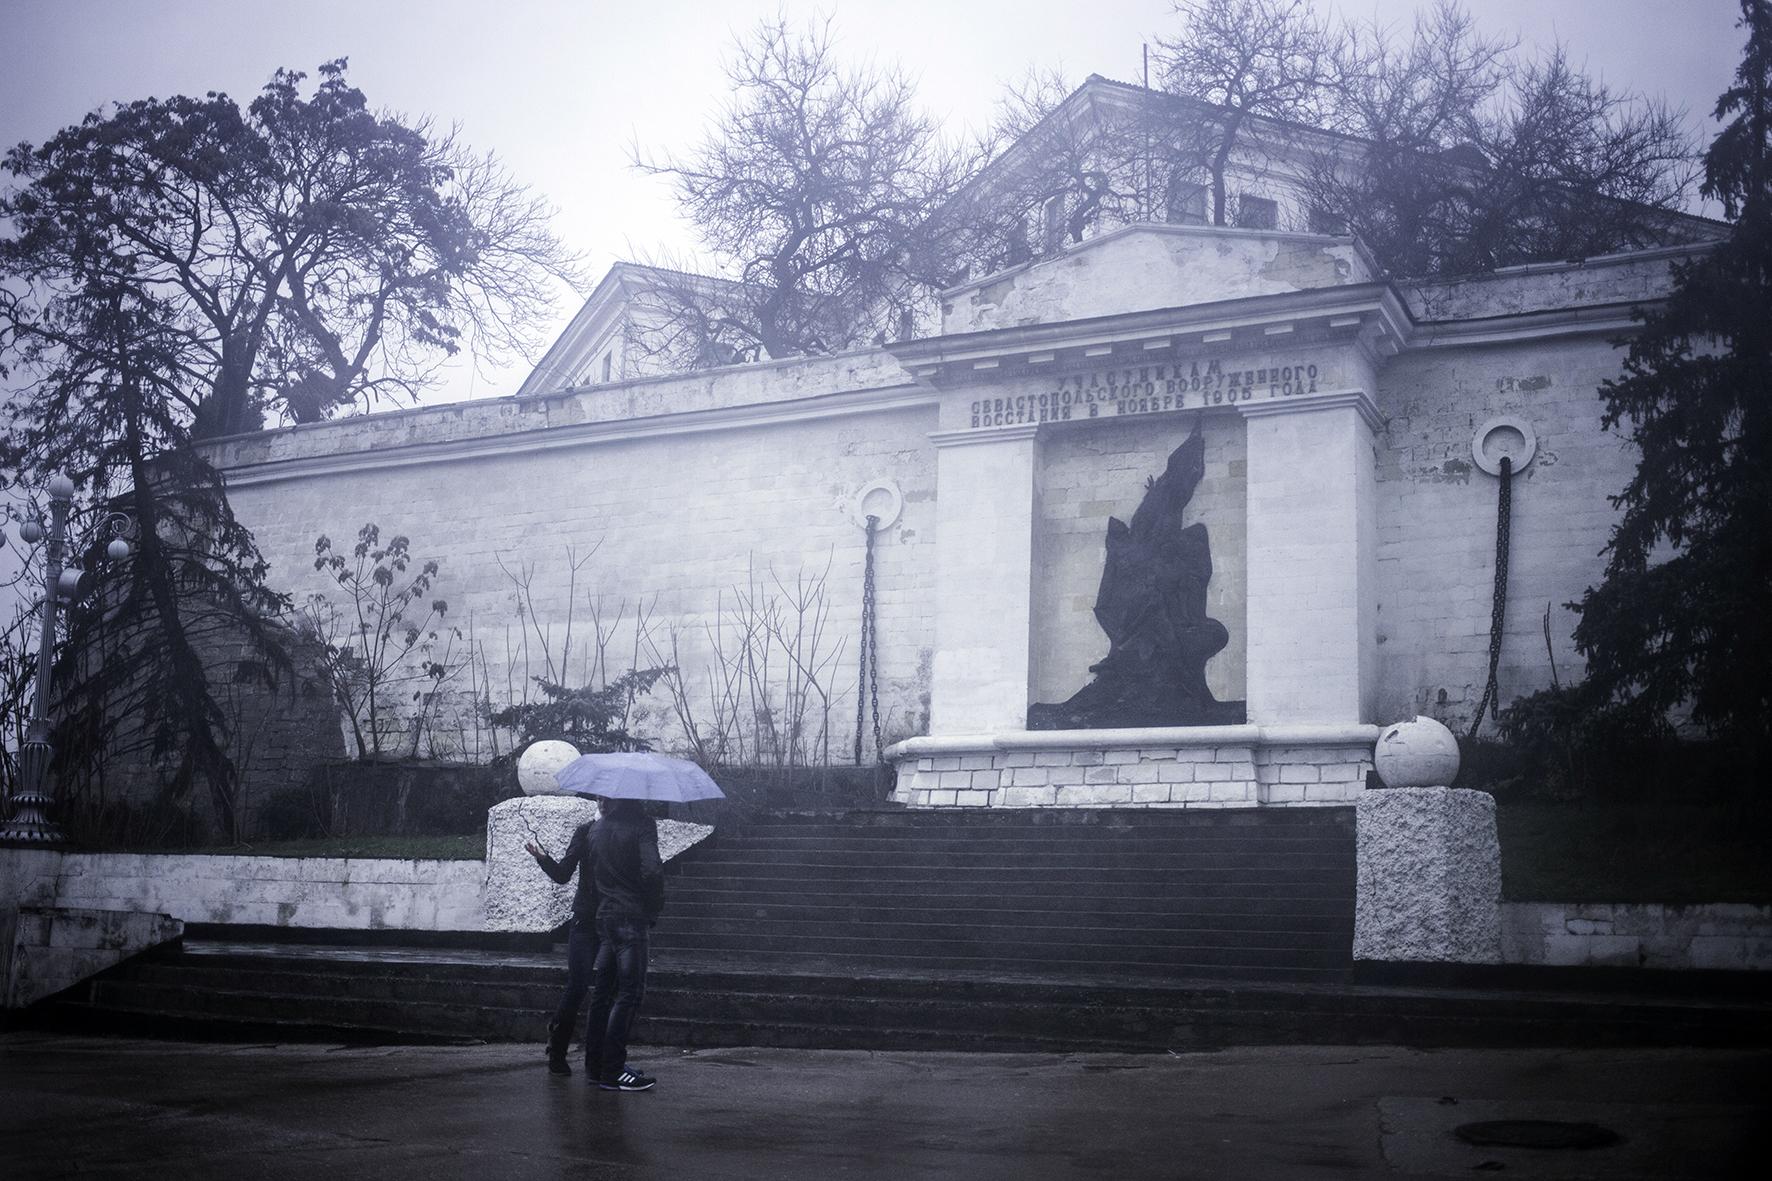 Sevastopol, Crimea, 2014